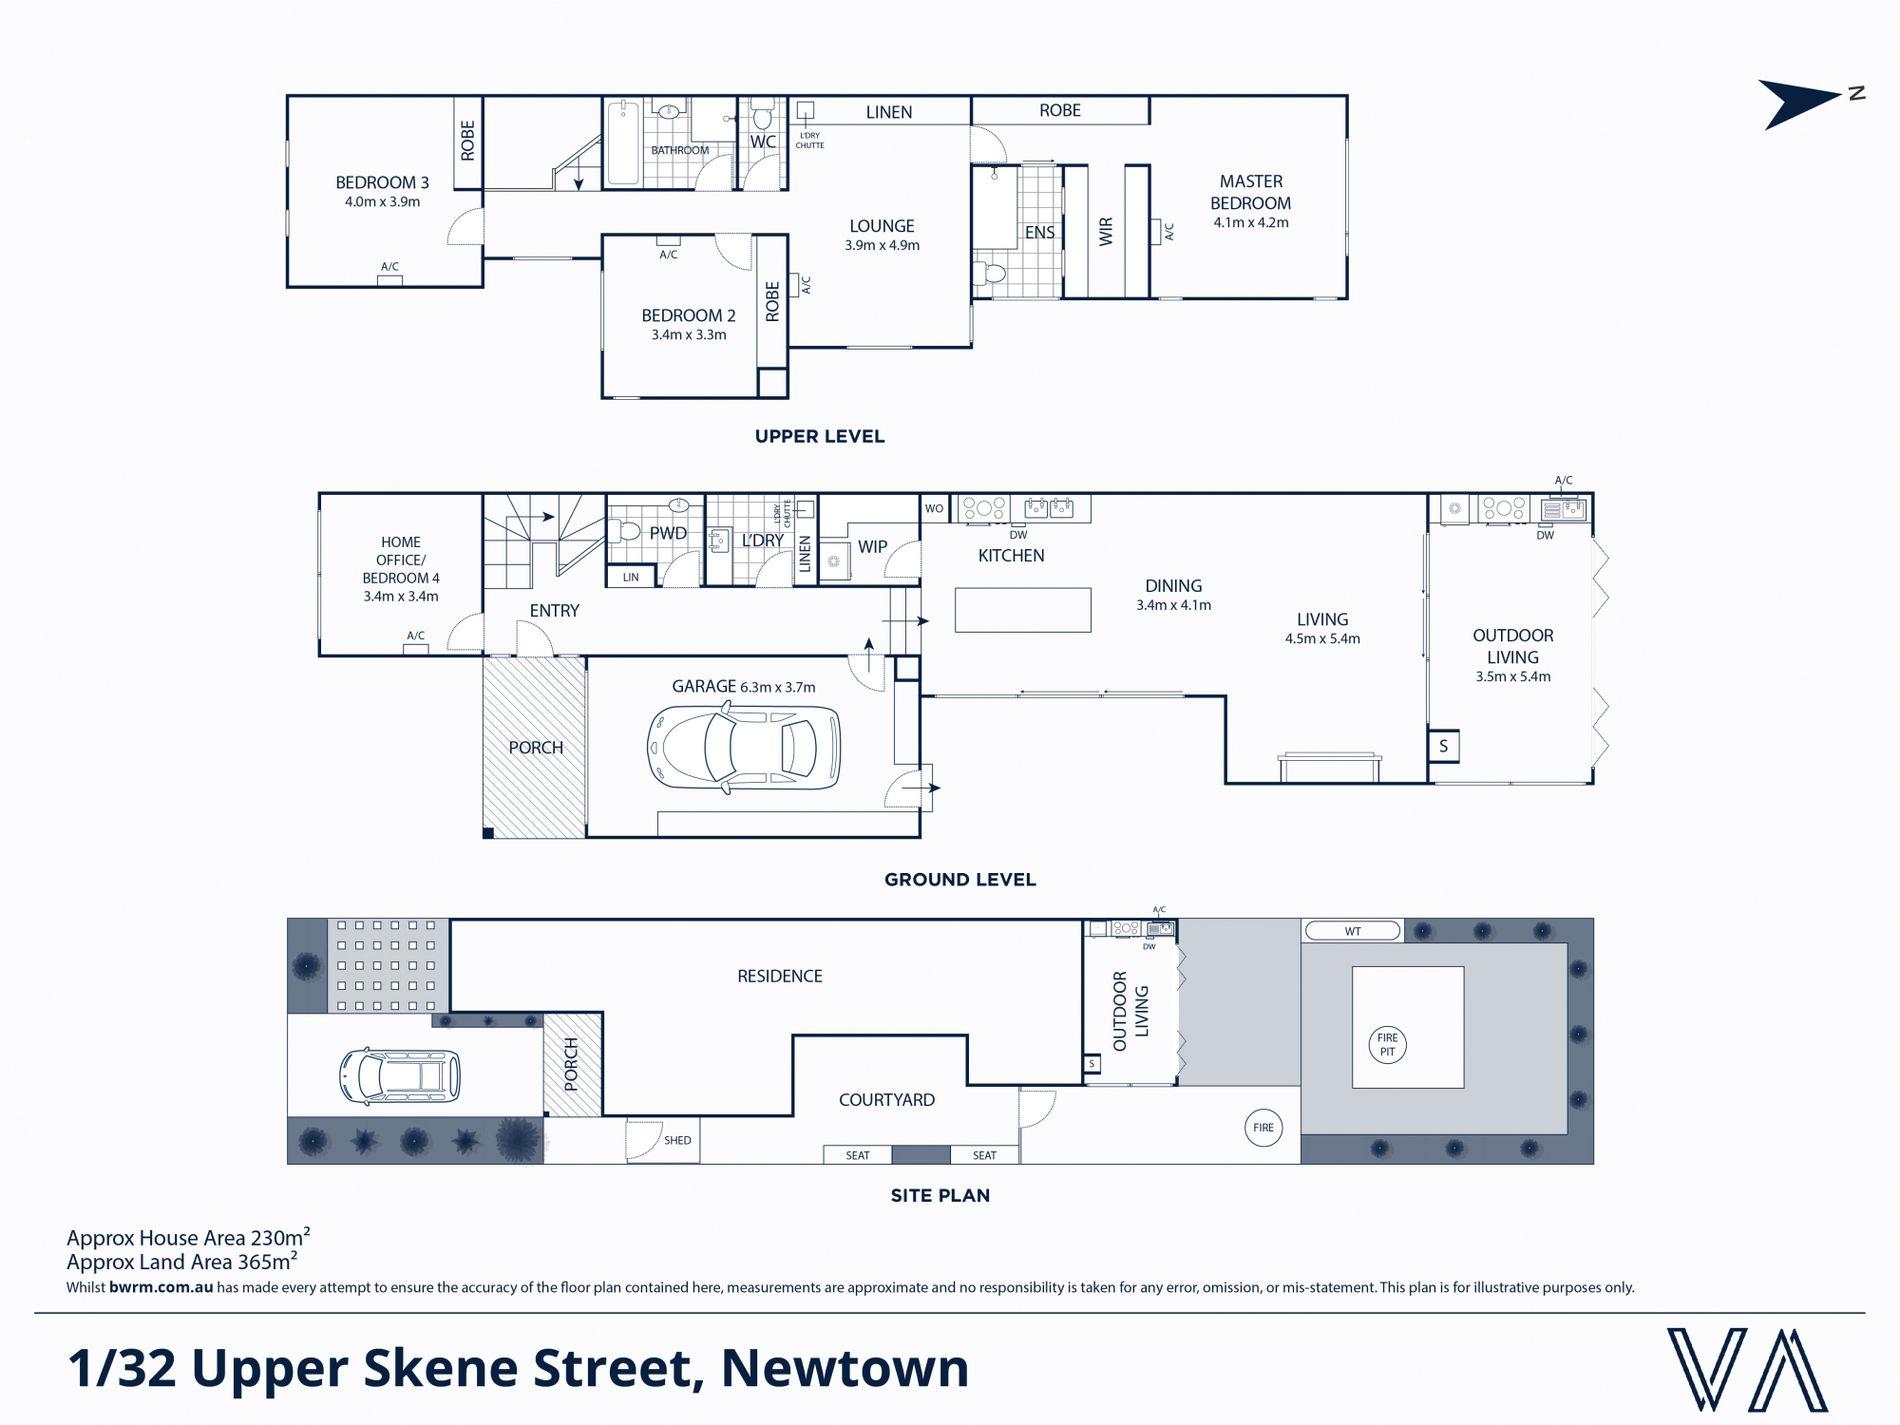 1 / 32 Upper Skene Street, Newtown